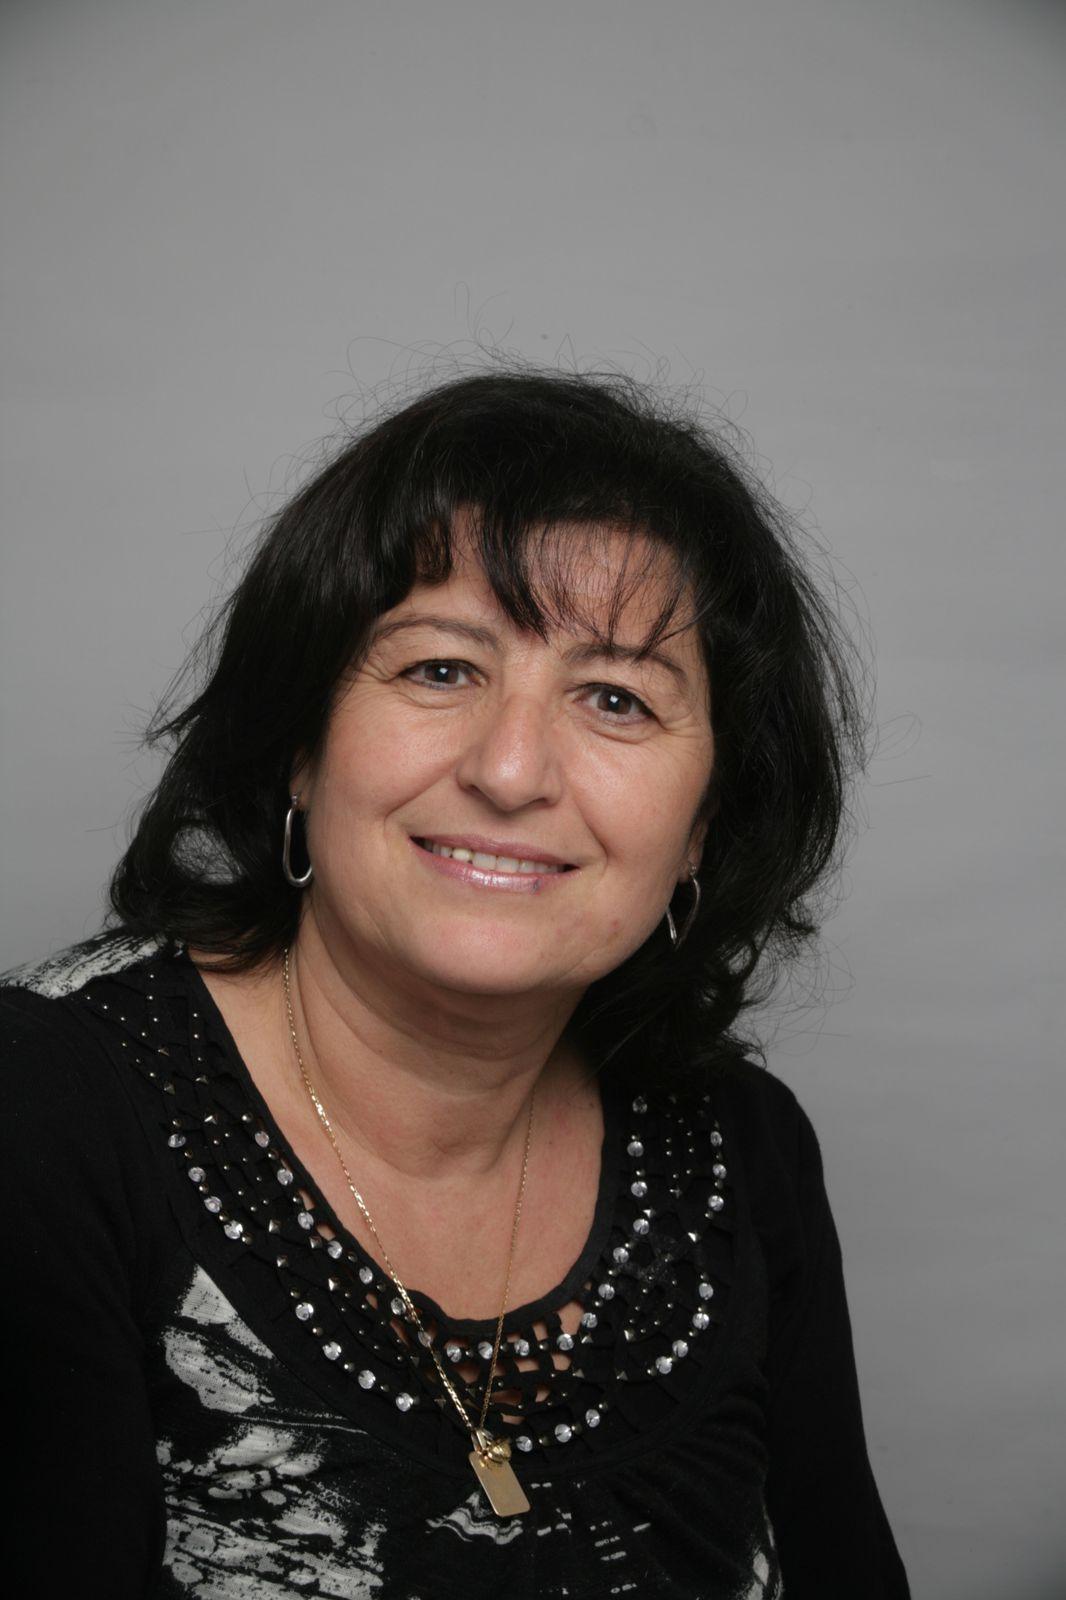 Anna CONSIGLIO, 55 ans, Mariée, 3 enfants, habite à Wittelsheim Grassegert, Comptable